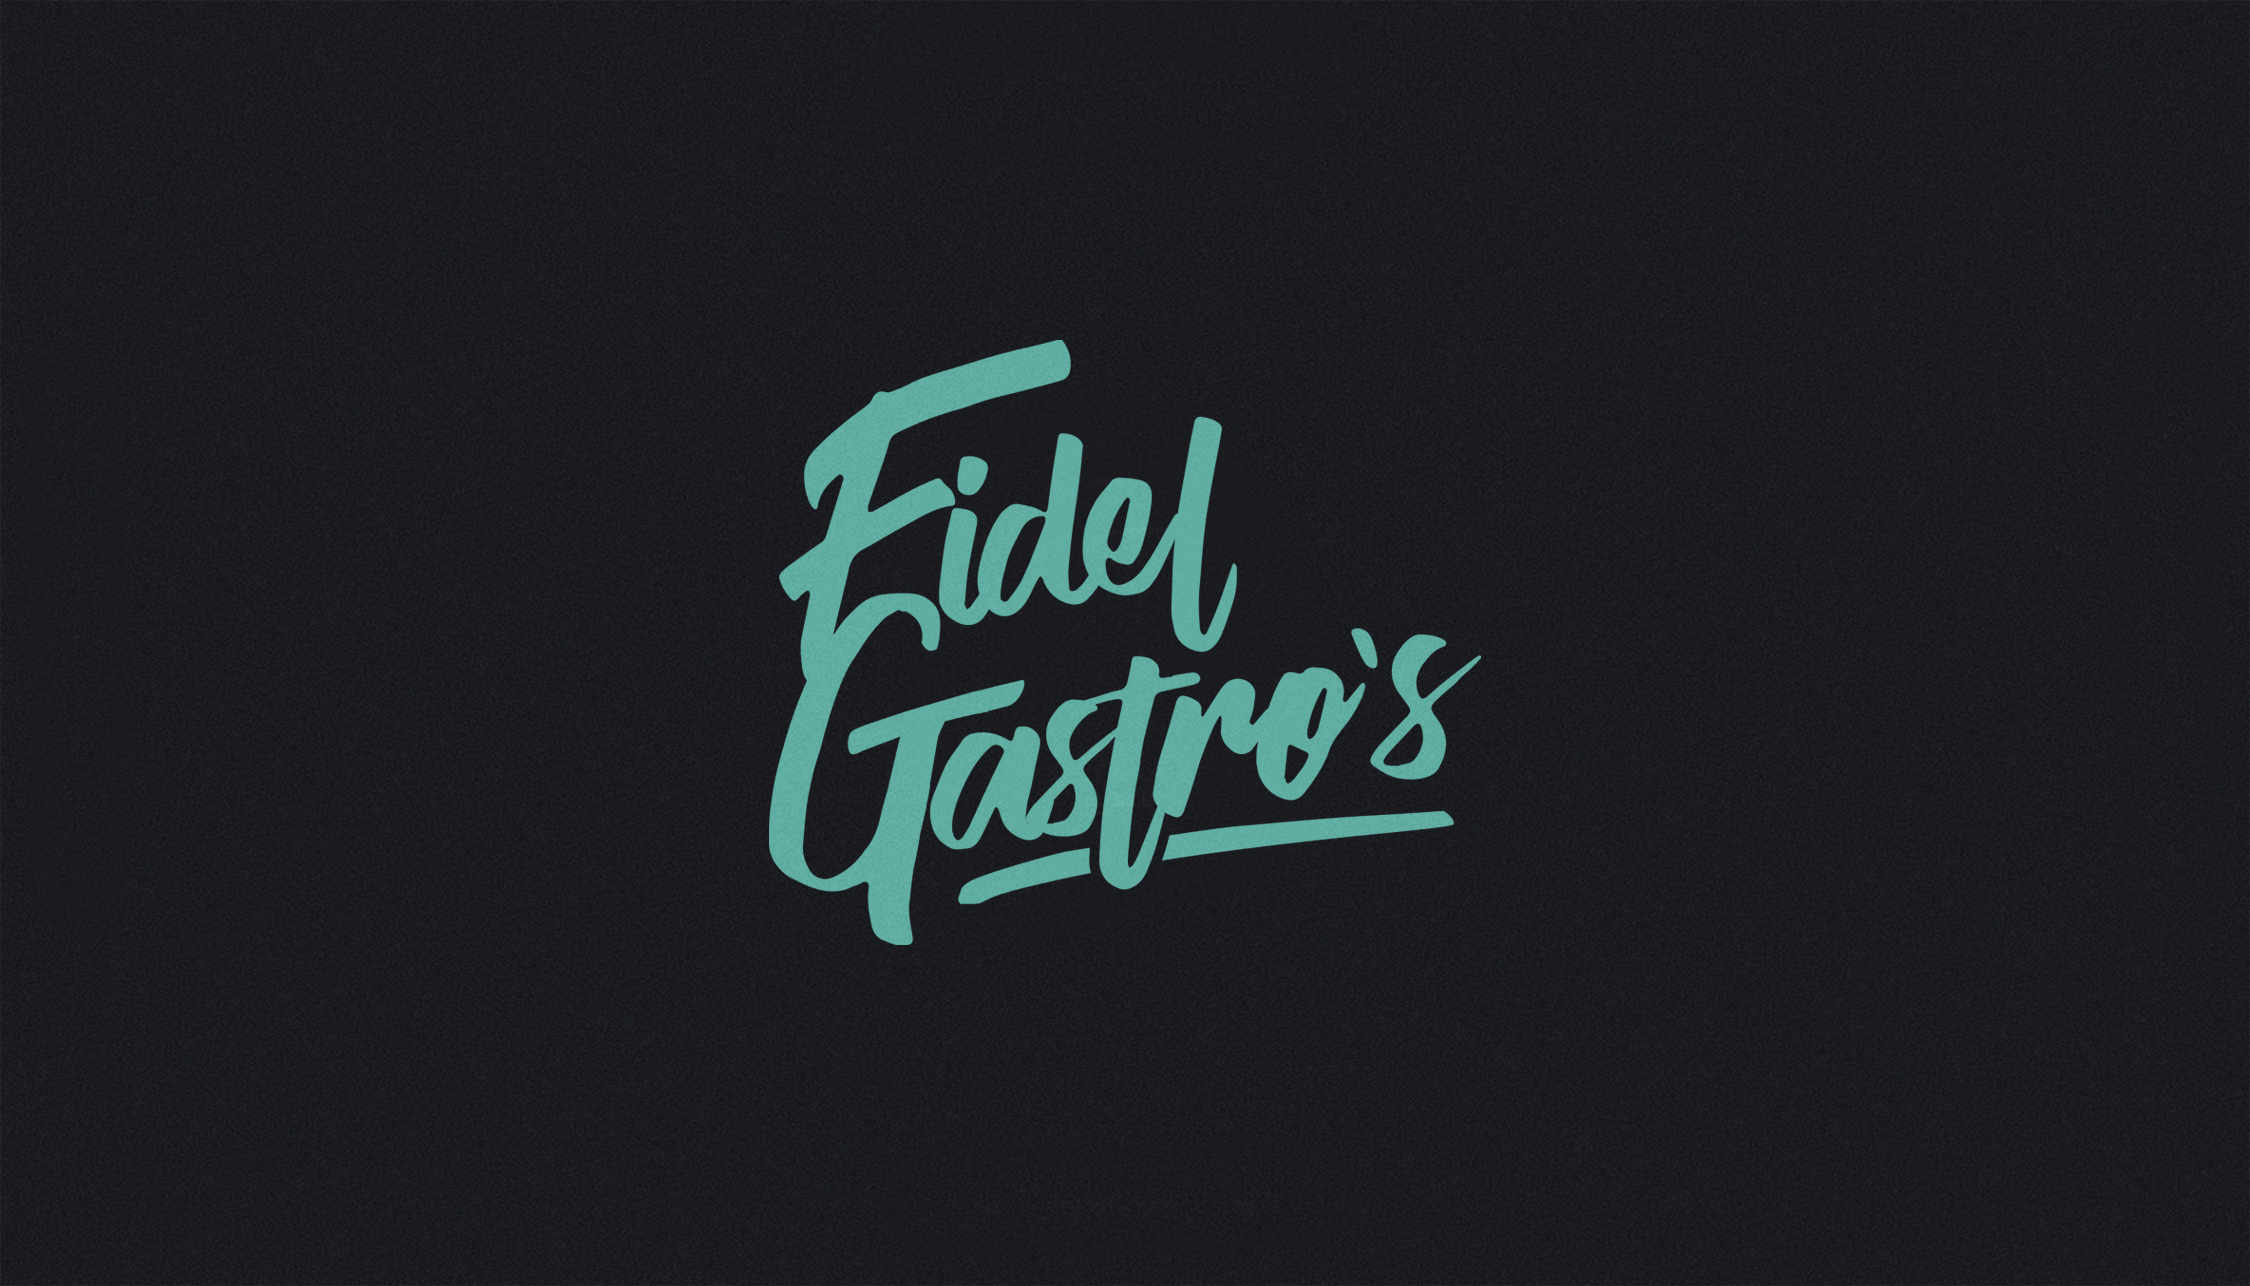 FIDEL GASTRO'S BRANDING